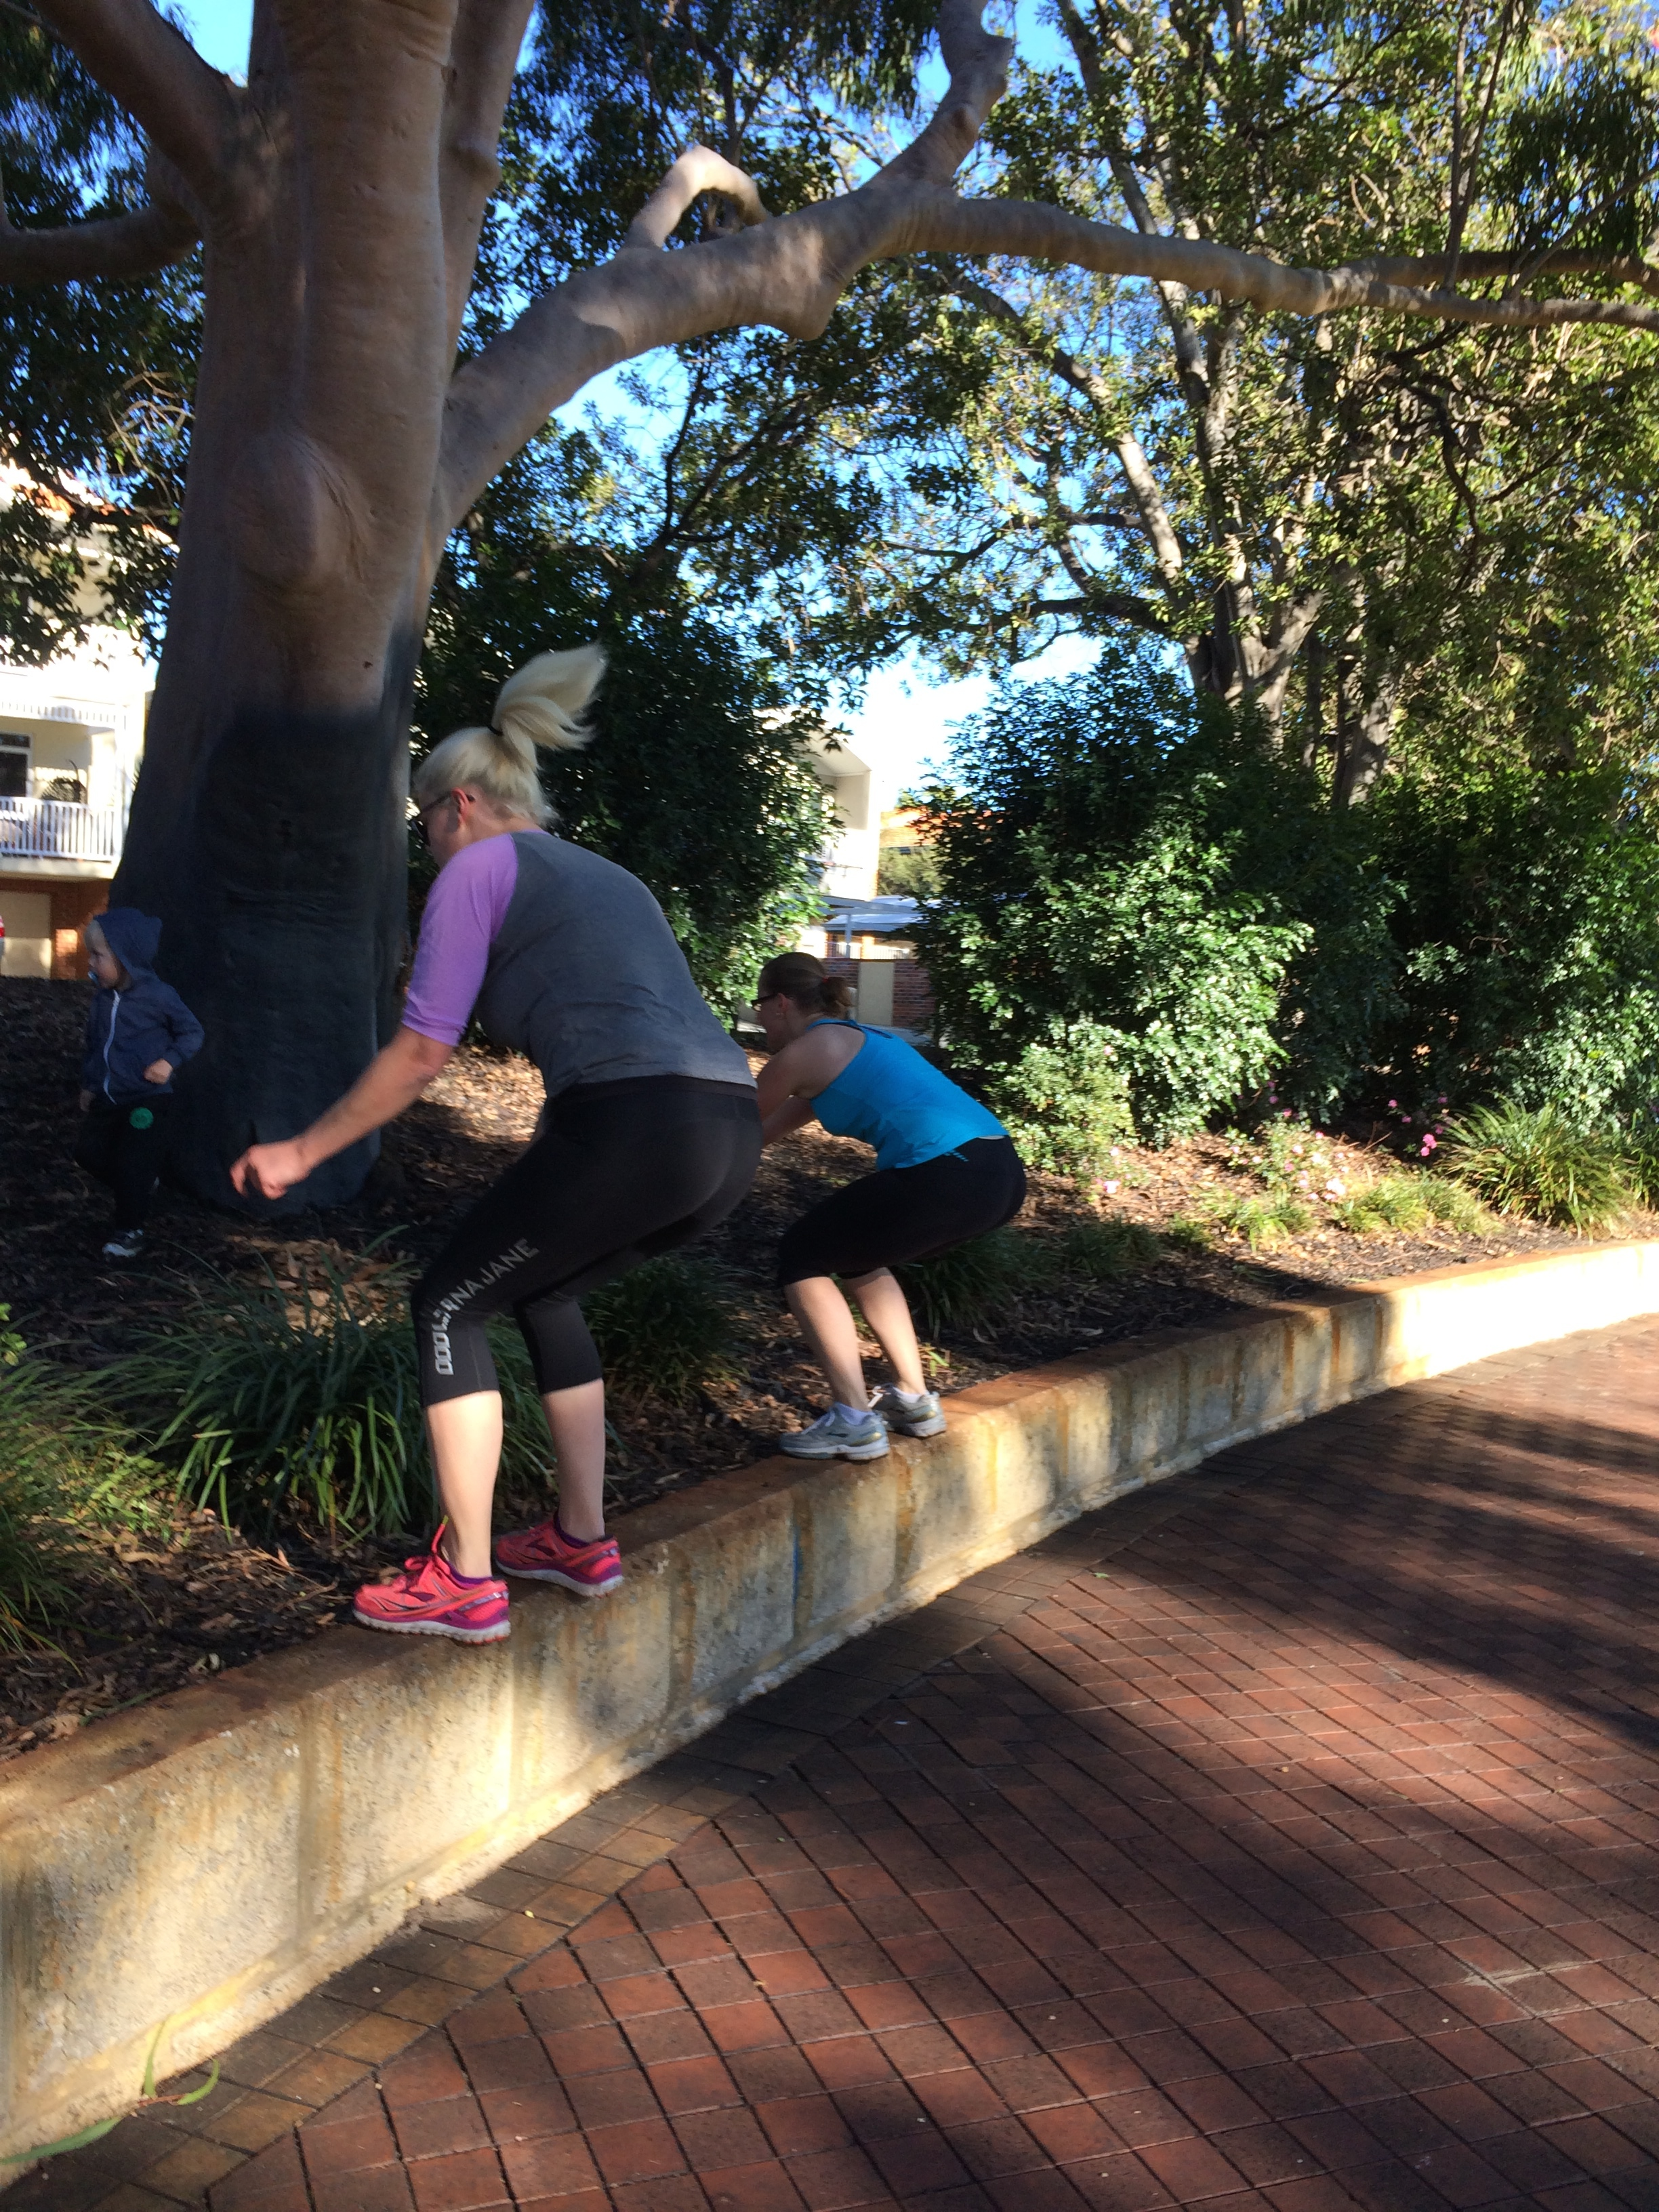 Making the wall jump look easy ladies!